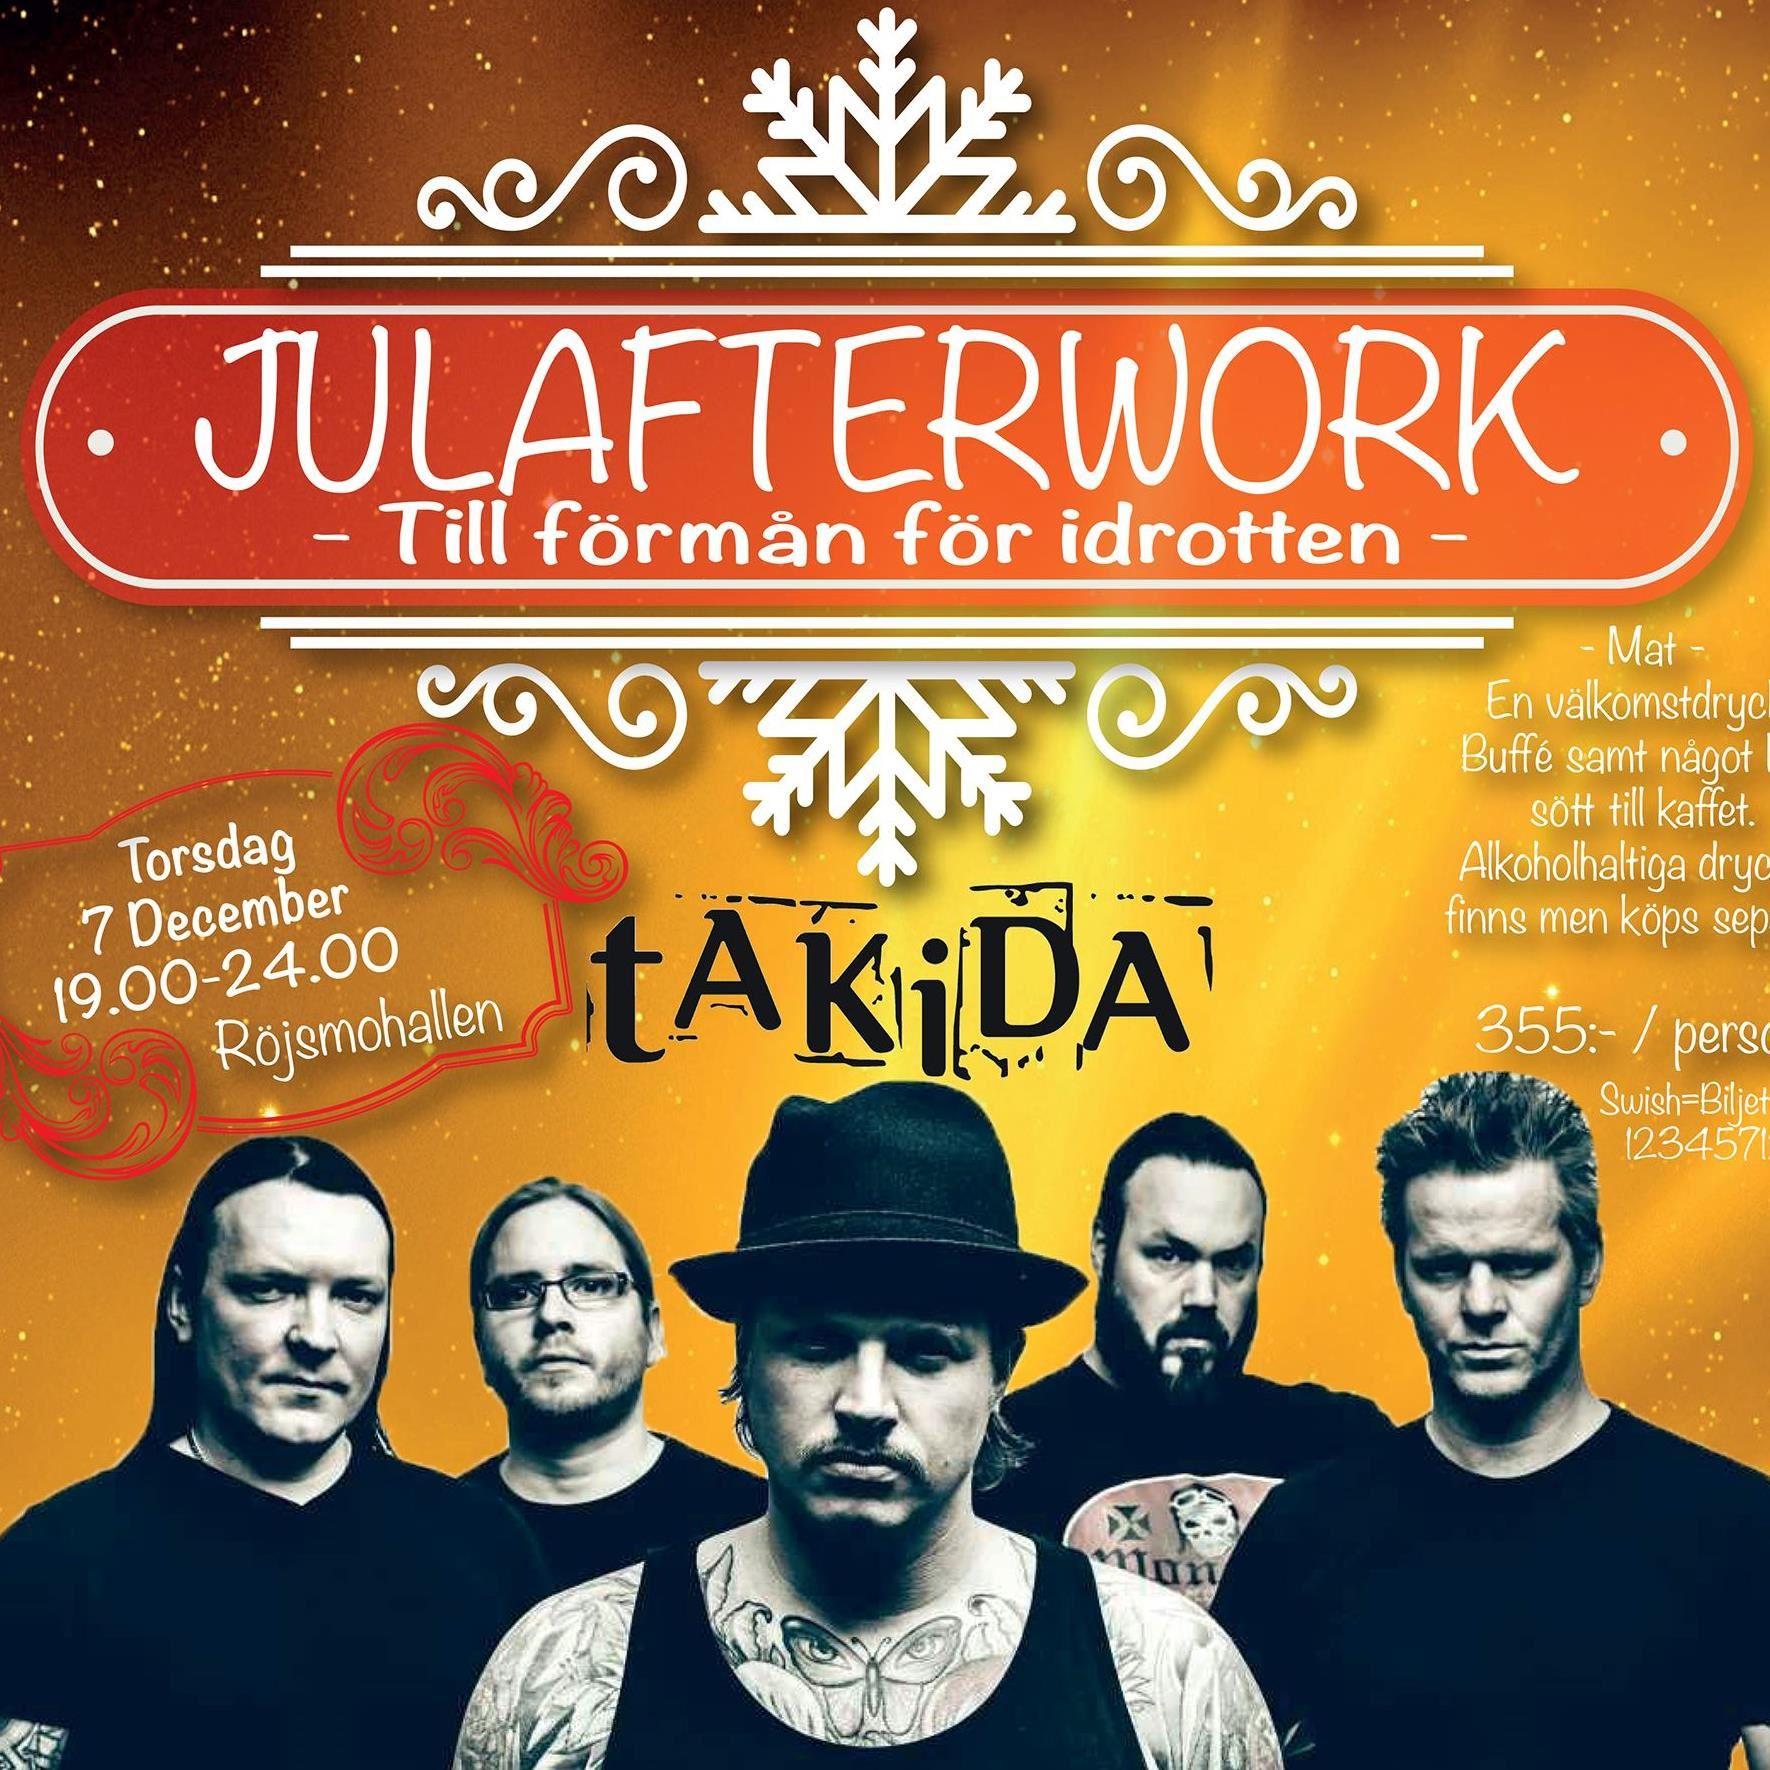 copy: Julafterwork,  © copy: Julafterwork, Julafterwork